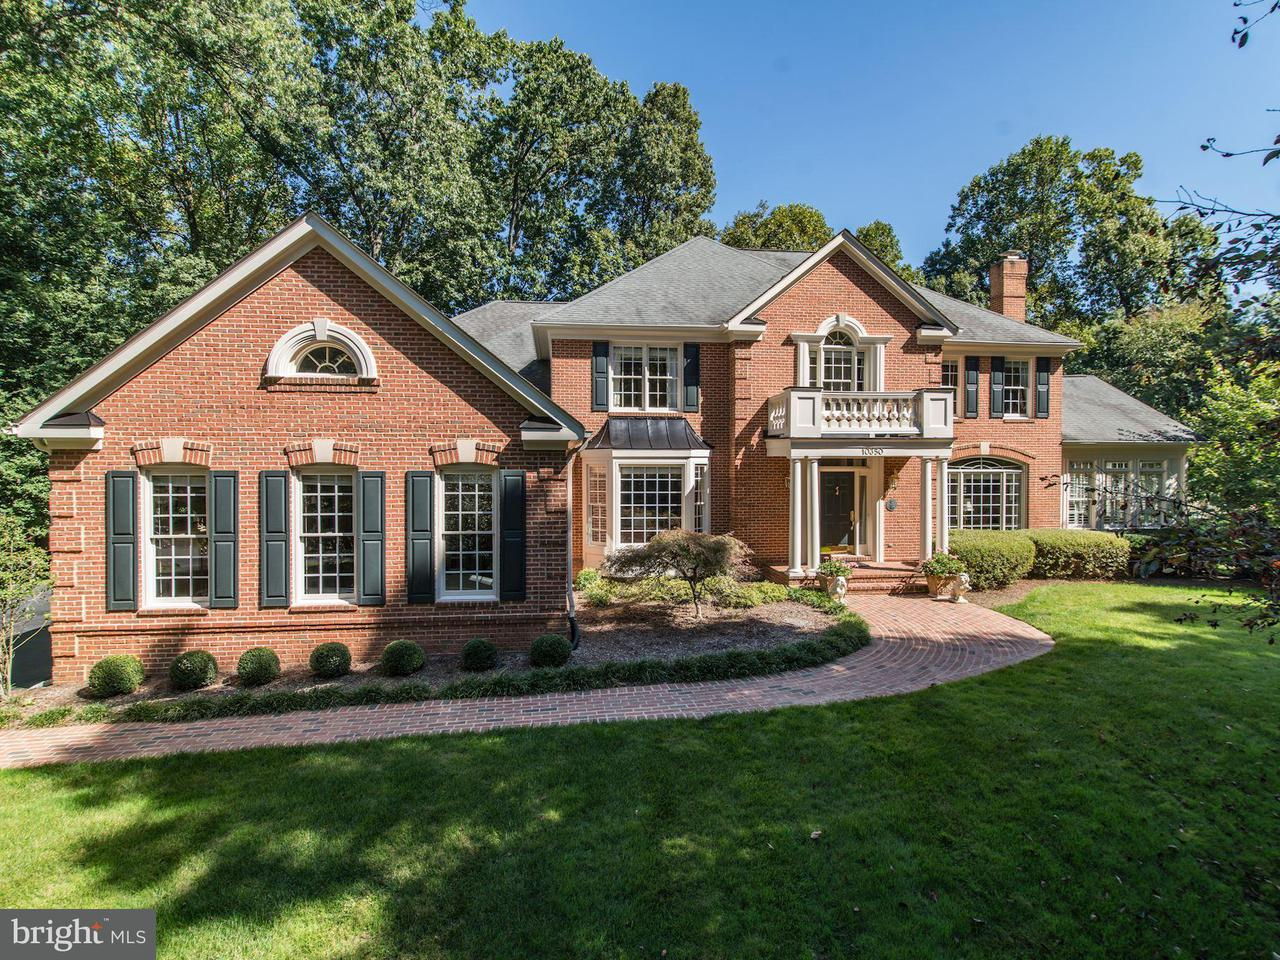 Single Family Home for Sale at 10350 Carol Street 10350 Carol Street Great Falls, Virginia 22066 United States